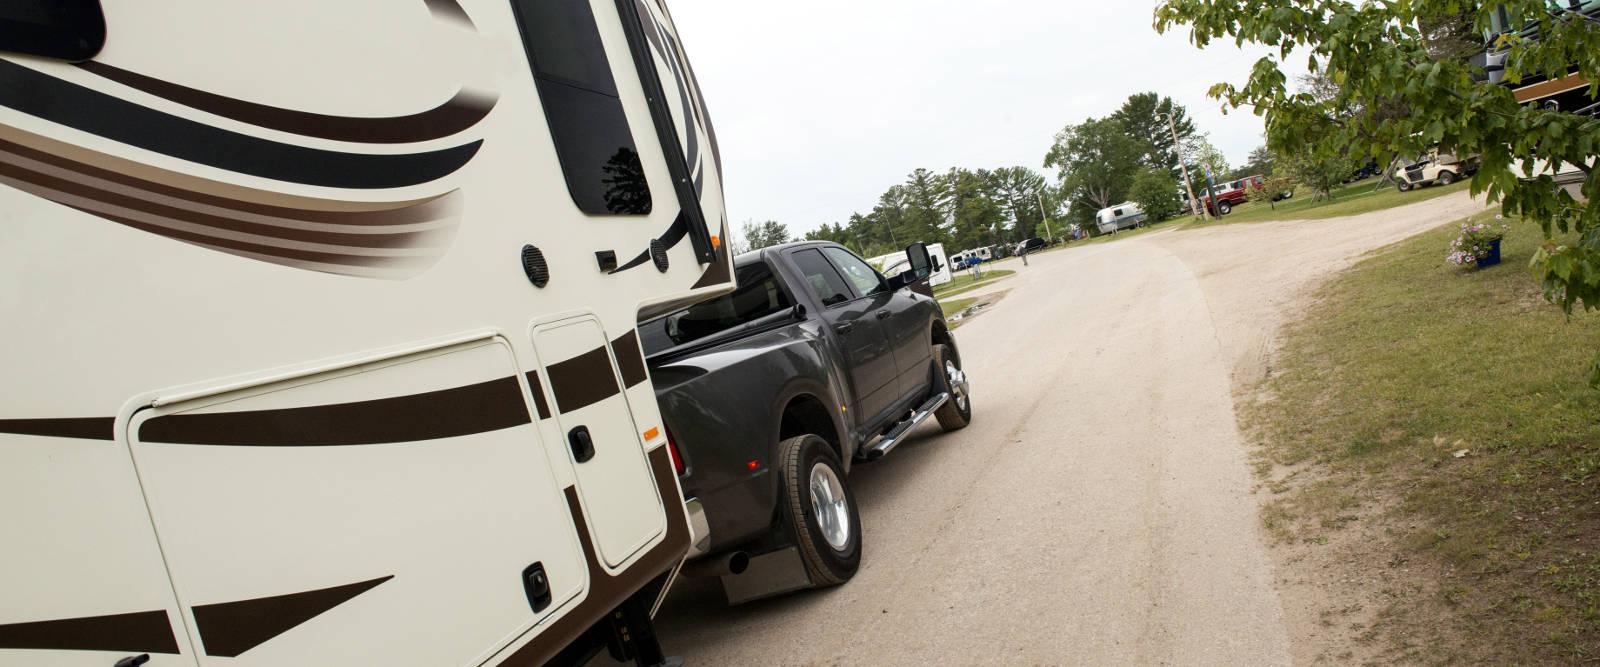 CURT 5th Wheel Hitch Dually Truck Travel Trailer